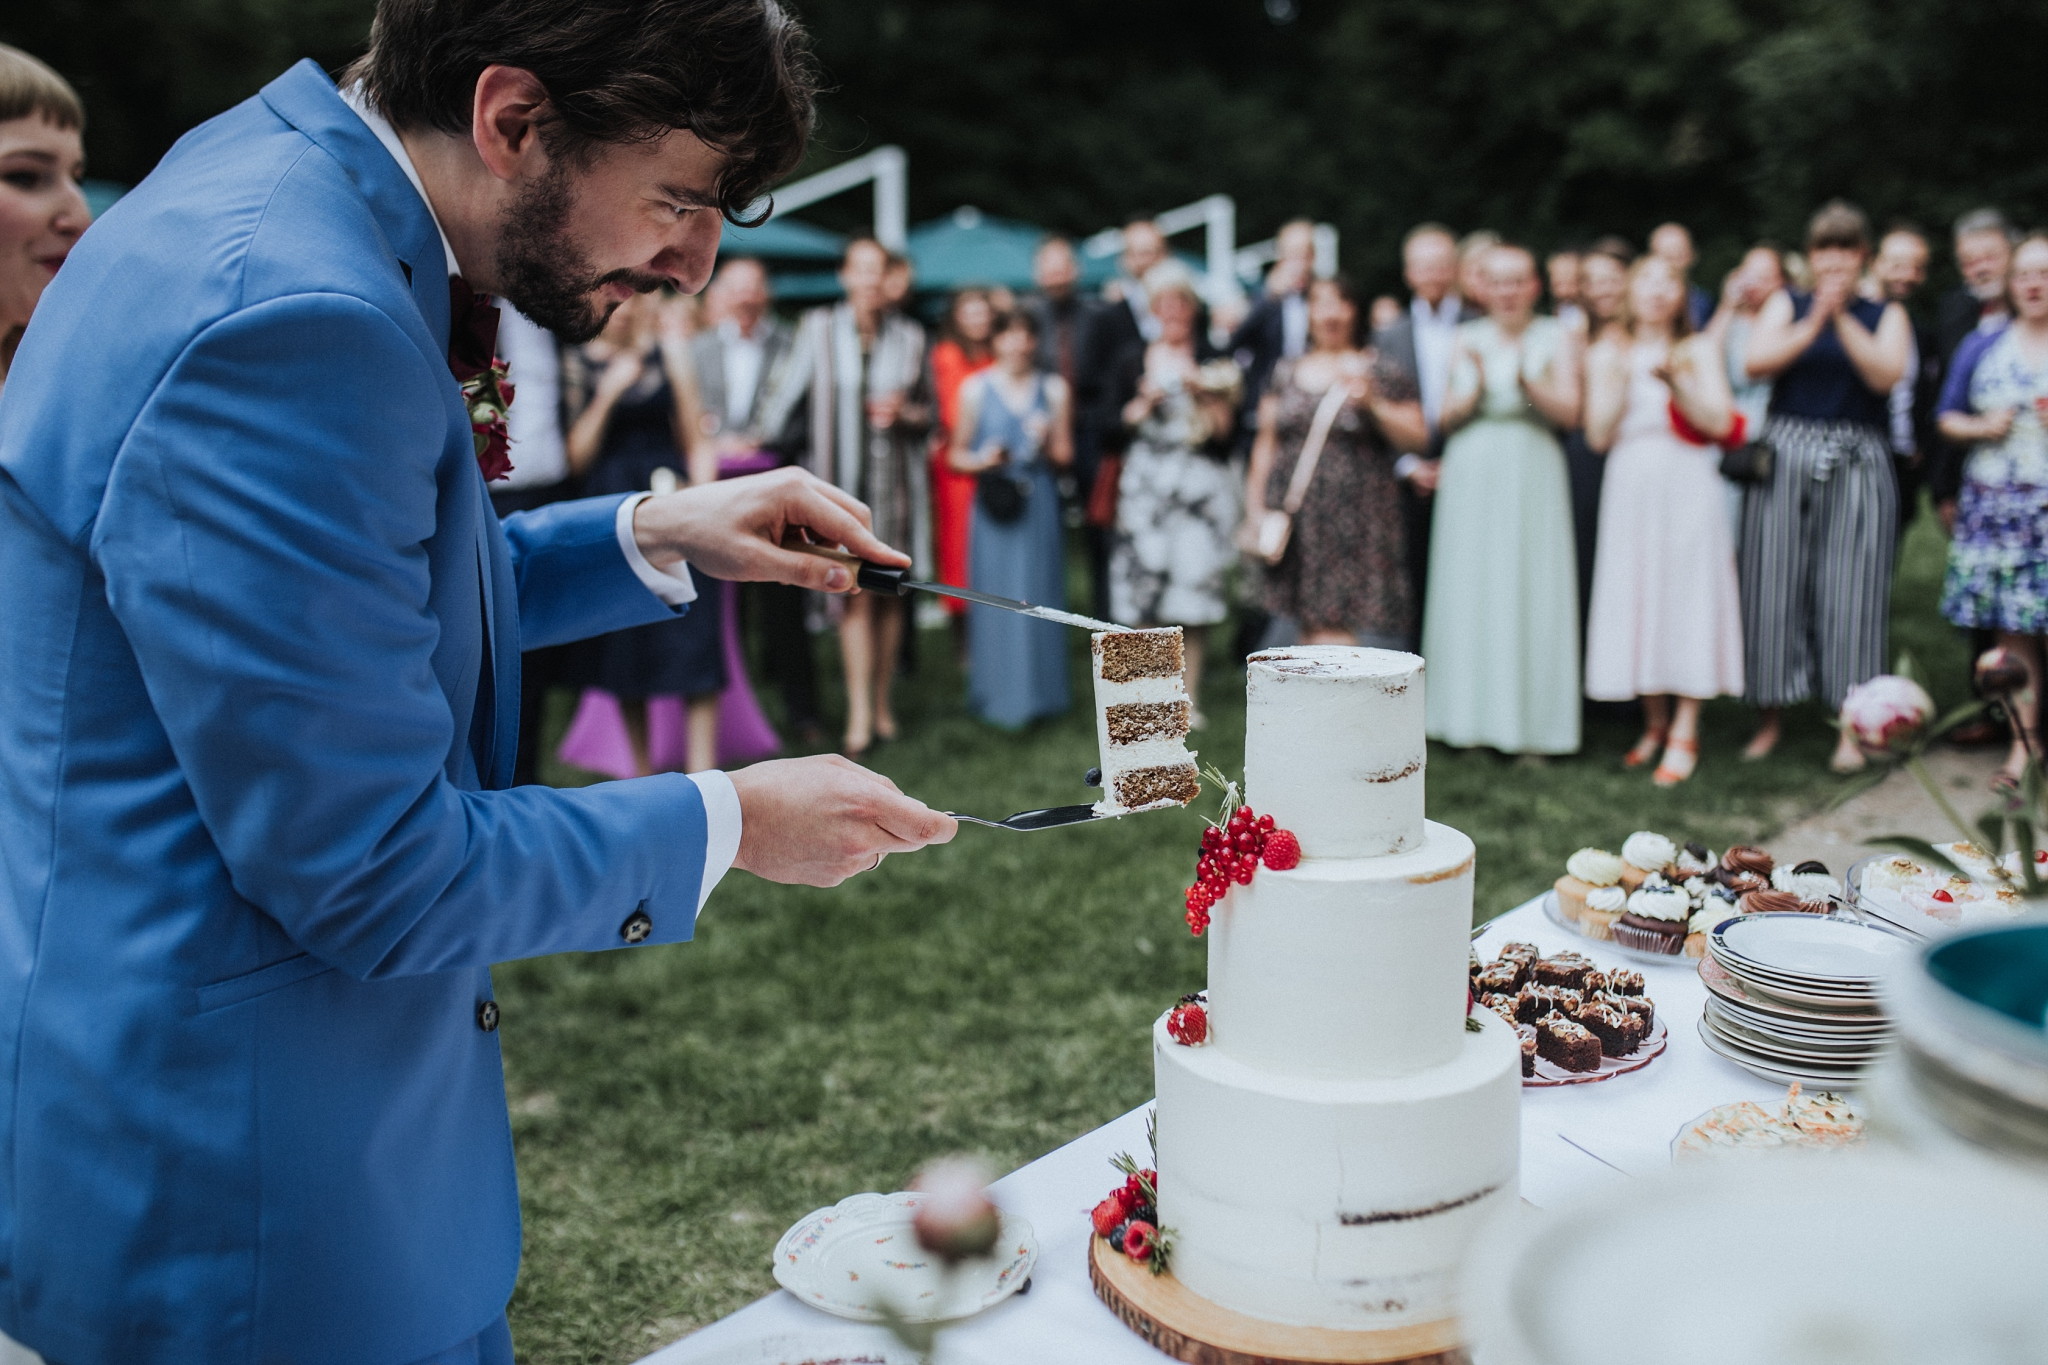 Schloss Blankensee Honeymoon Pictures Hochzeitsfotografie HochzeitsfotografBerlin Berlin Hochzeitsreportage Braut Bräutigam GettingReady WeddingphotographerBerlin freie Trauung